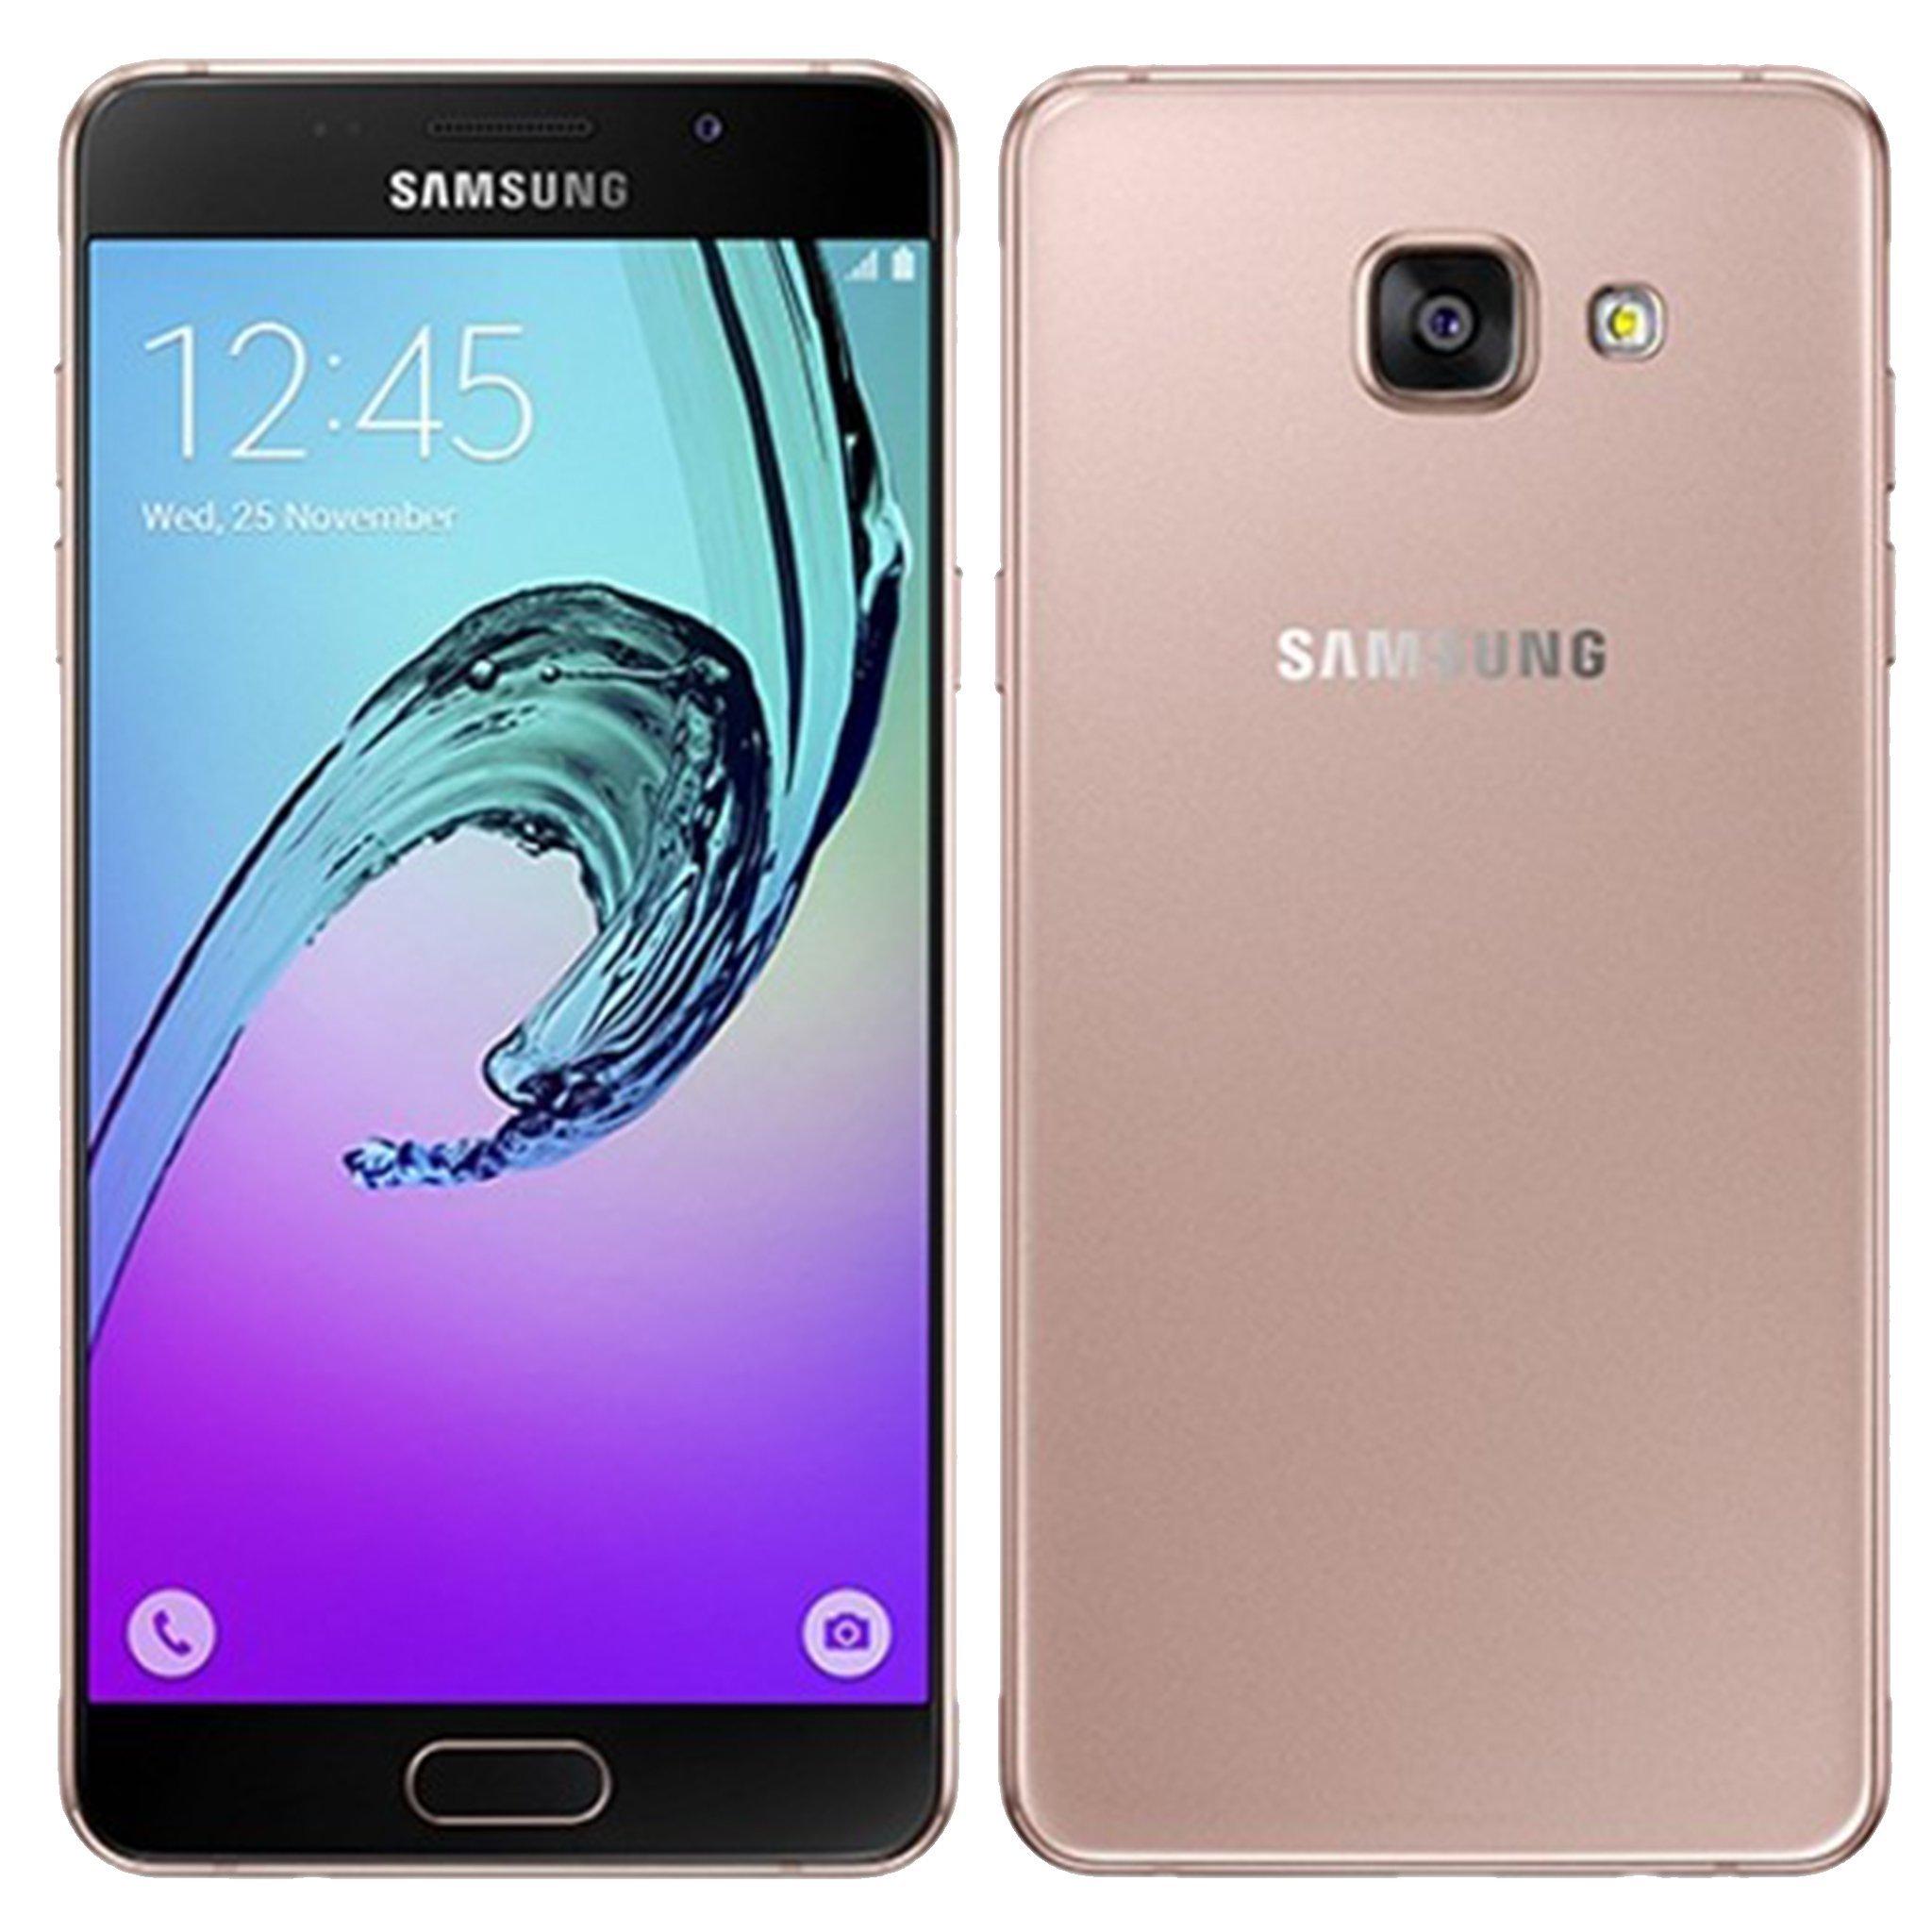 Samsung Galaxy A5 (2016) 16GB SM-A510F Factory Unlocked 4G/LTE Single-SIM Smartphone - International Version with No Warranty (Pink)